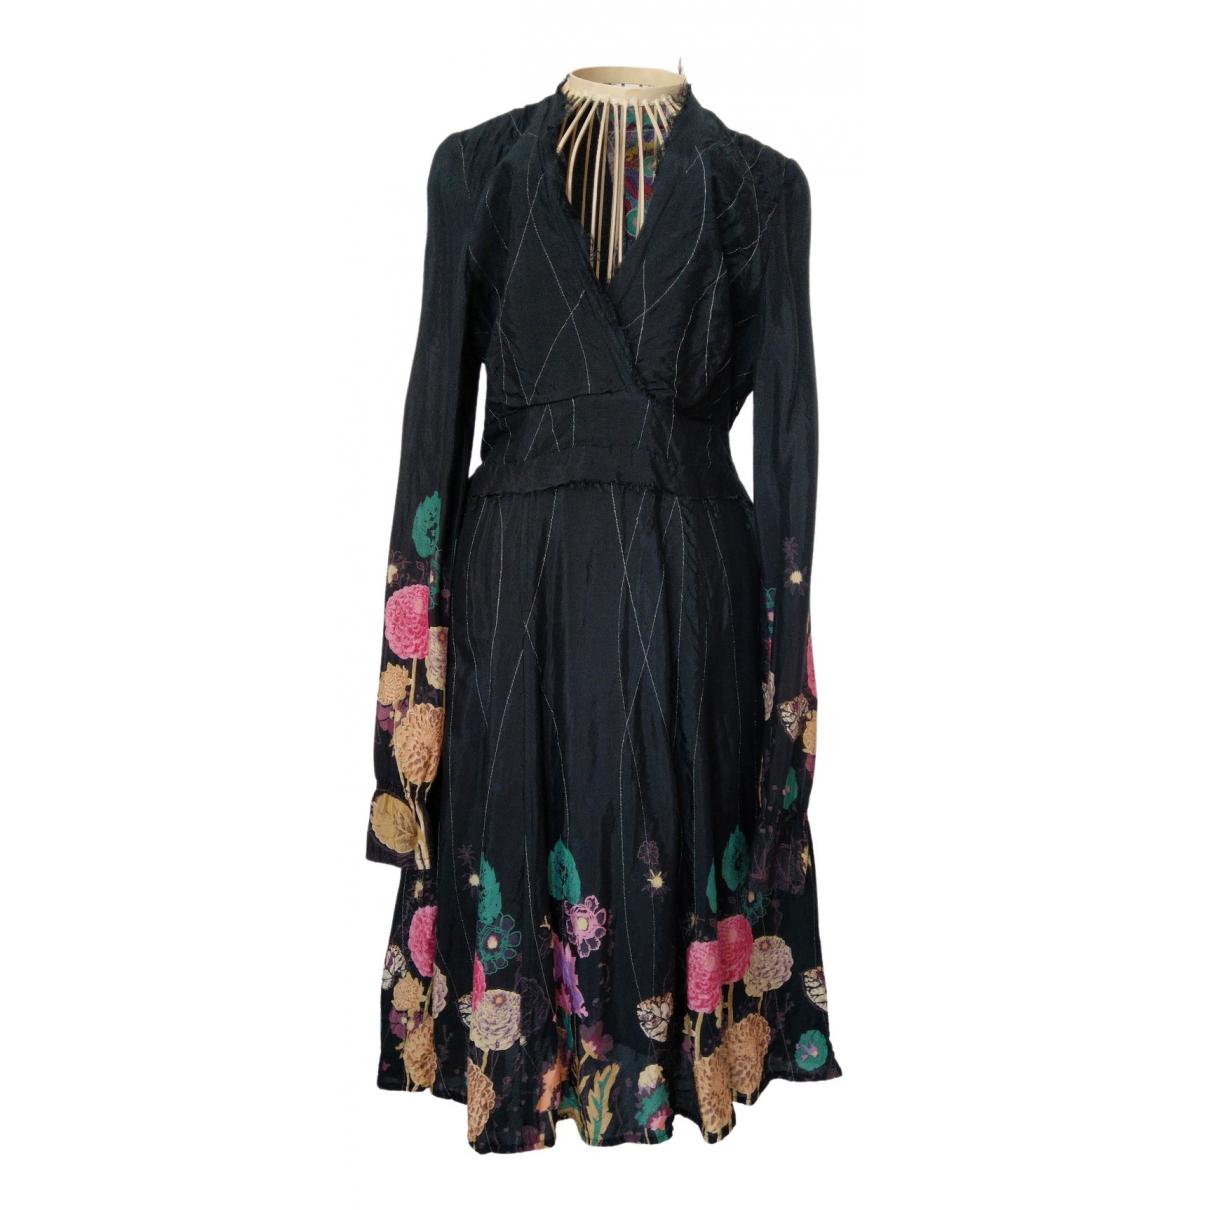 Desigual \N Kleid in  Schwarz Baumwolle